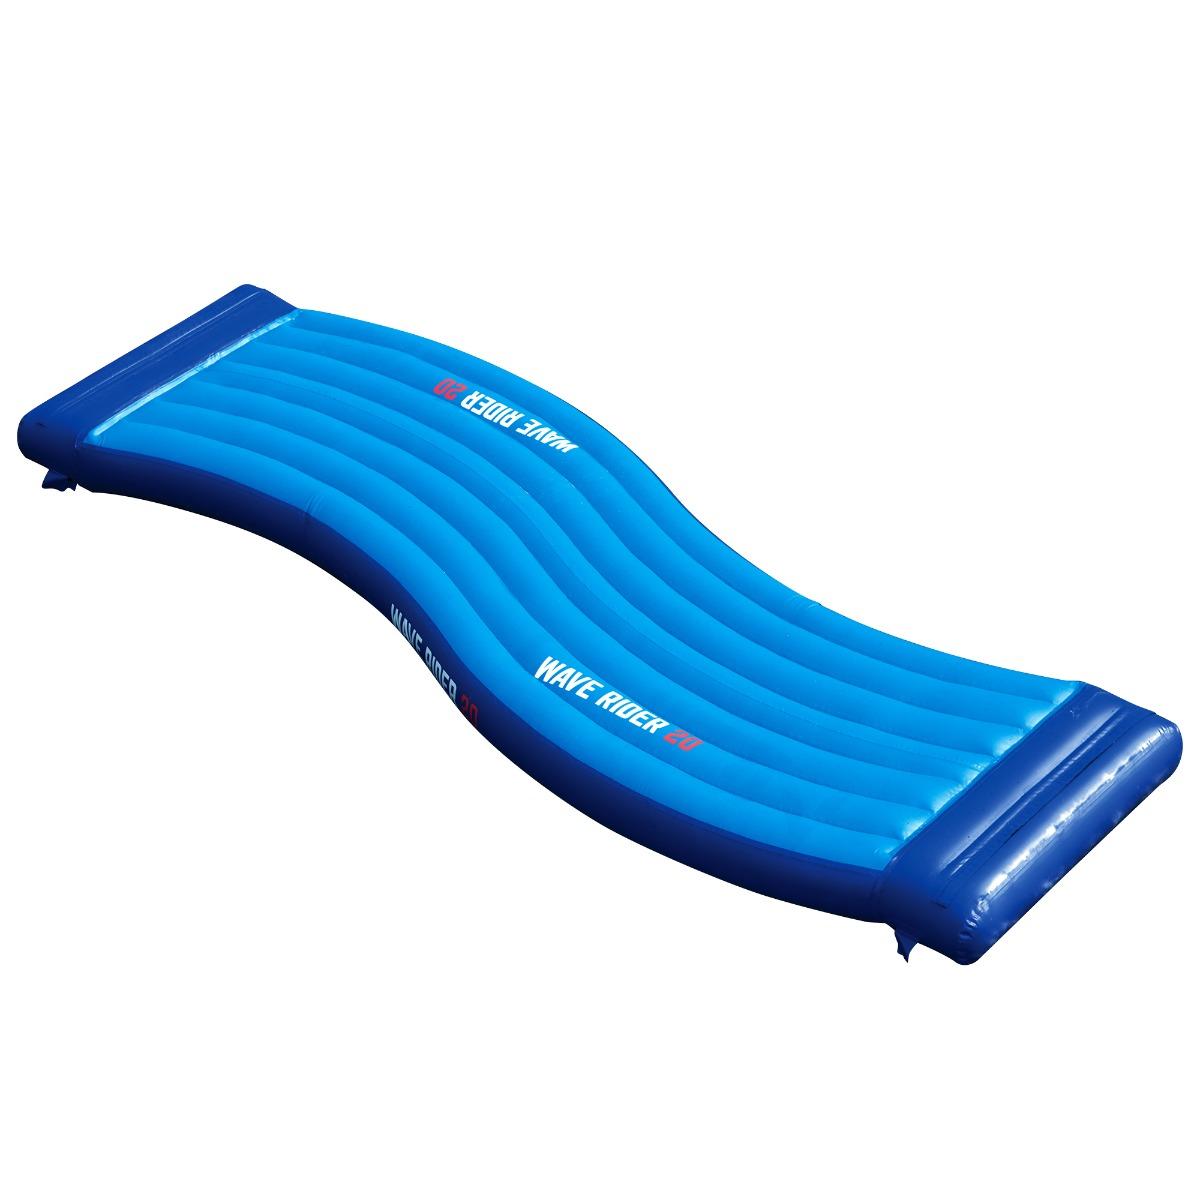 User Manual: Union Aquaparks Wave Rider 20